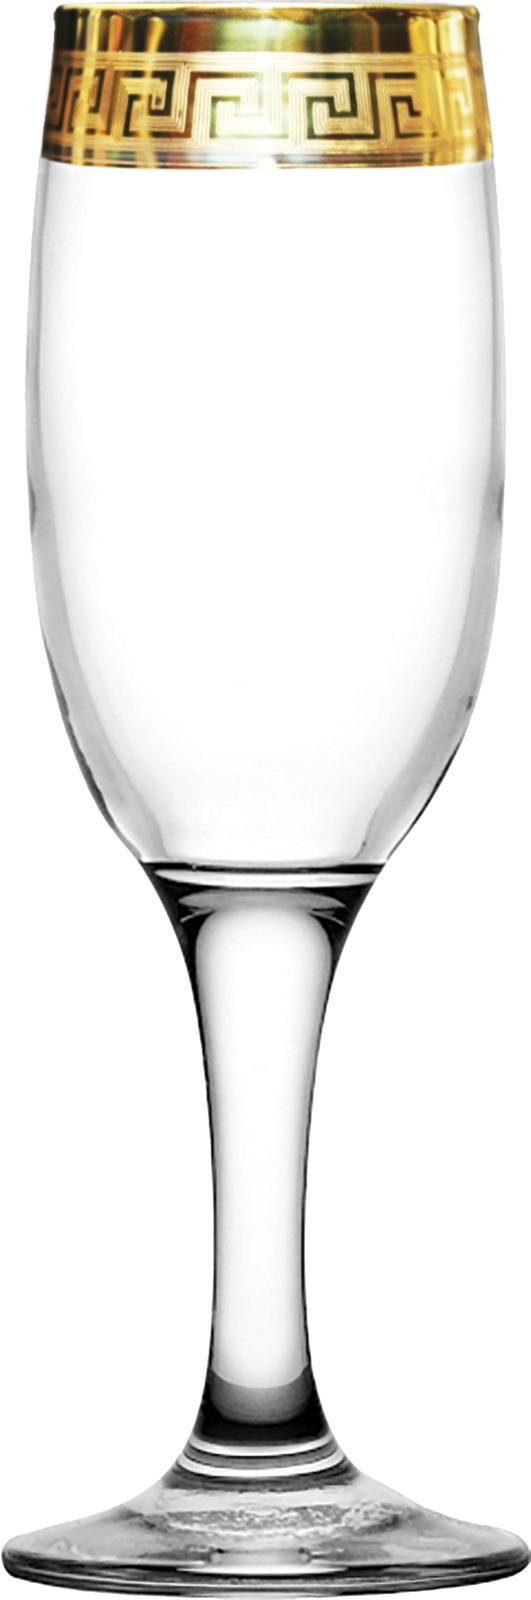 Набор бокалов Гусь-Хрустальный Пирамида, TAV91-419, 190 мл, 6 шт набор бокалов гусь хрустальный версаче голд tav91 160 200 мл 6 шт